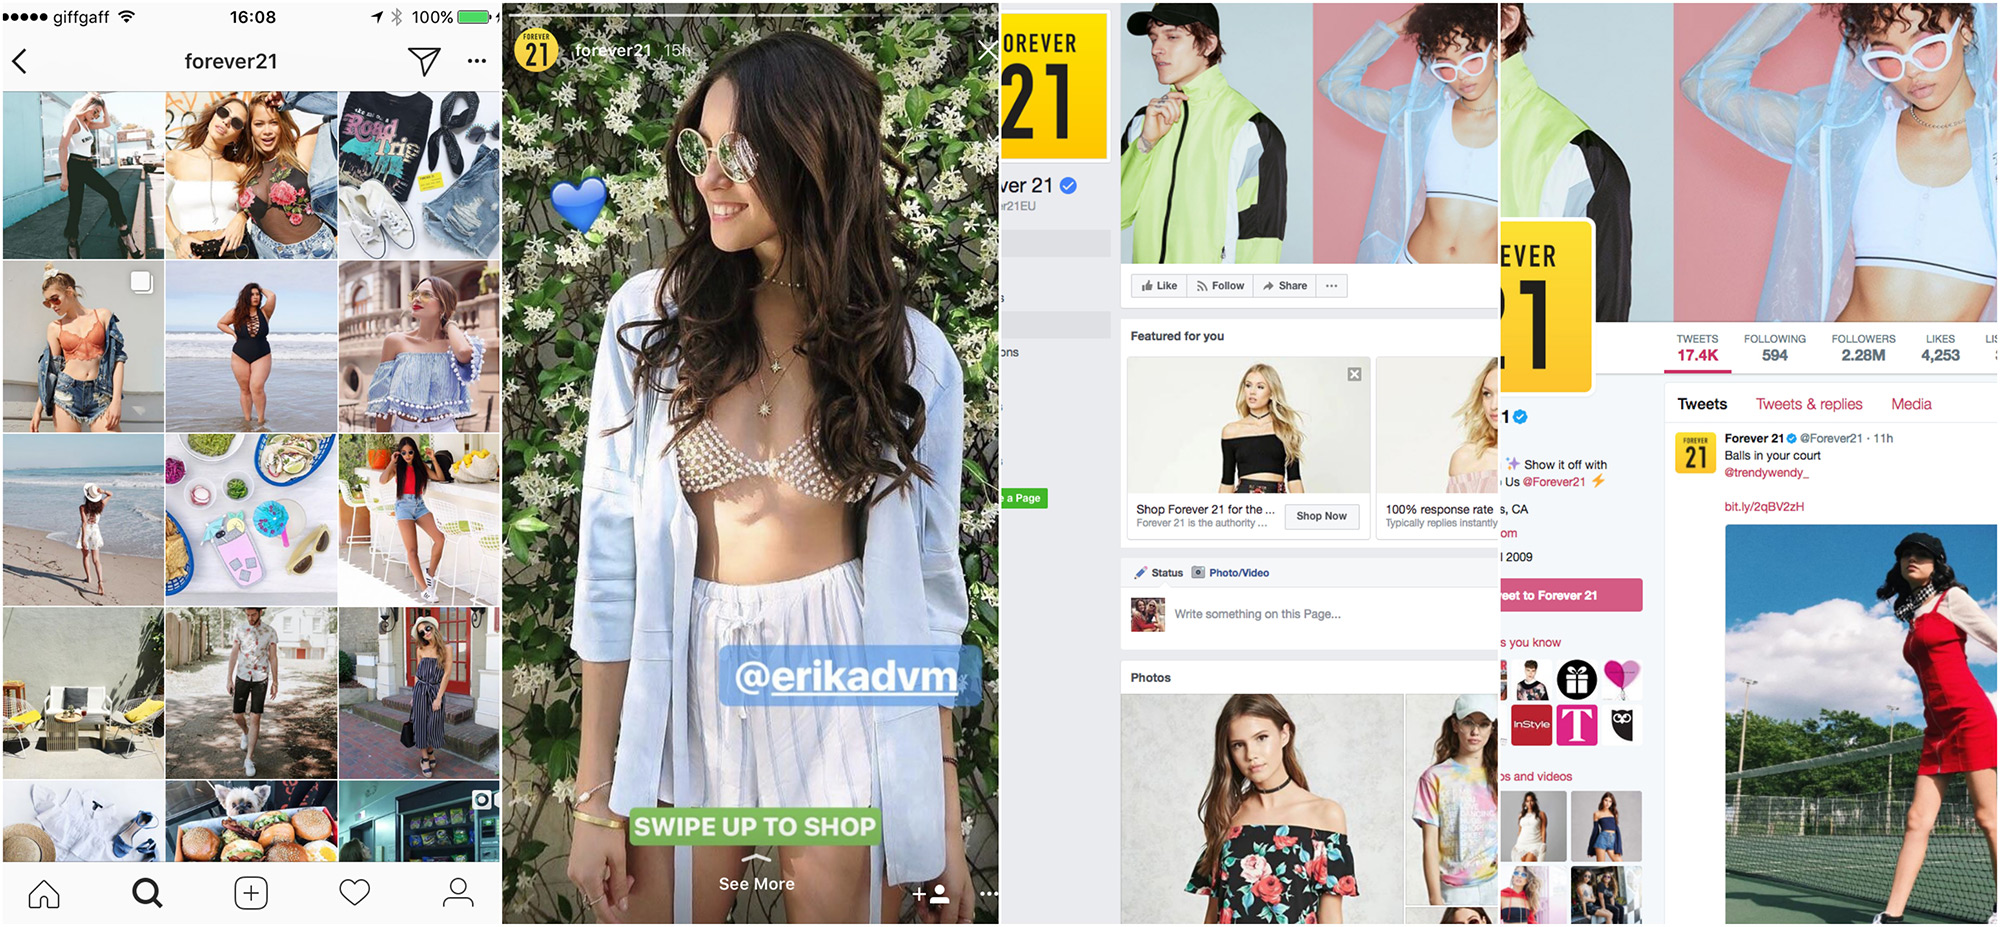 SOCIAL MEDIA MARKETING STRATEGY, Stories Social Media, Online Marketing, Digital Marketing, Marketing Agency